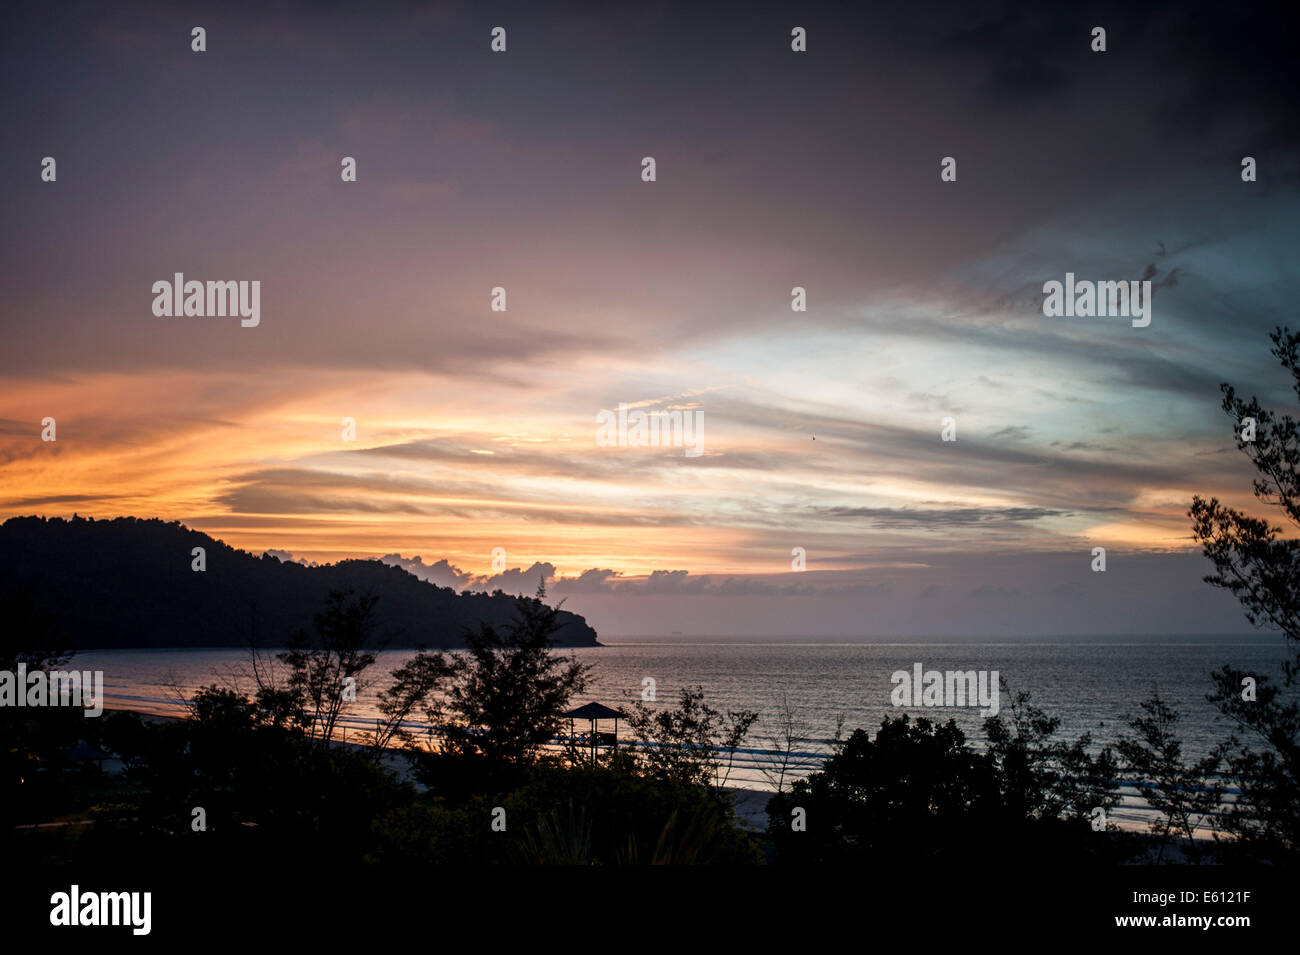 Sunset at Kota Kinabalu on 03 August 2014 in Kota Kinabalu, Malaysia. - Stock Image